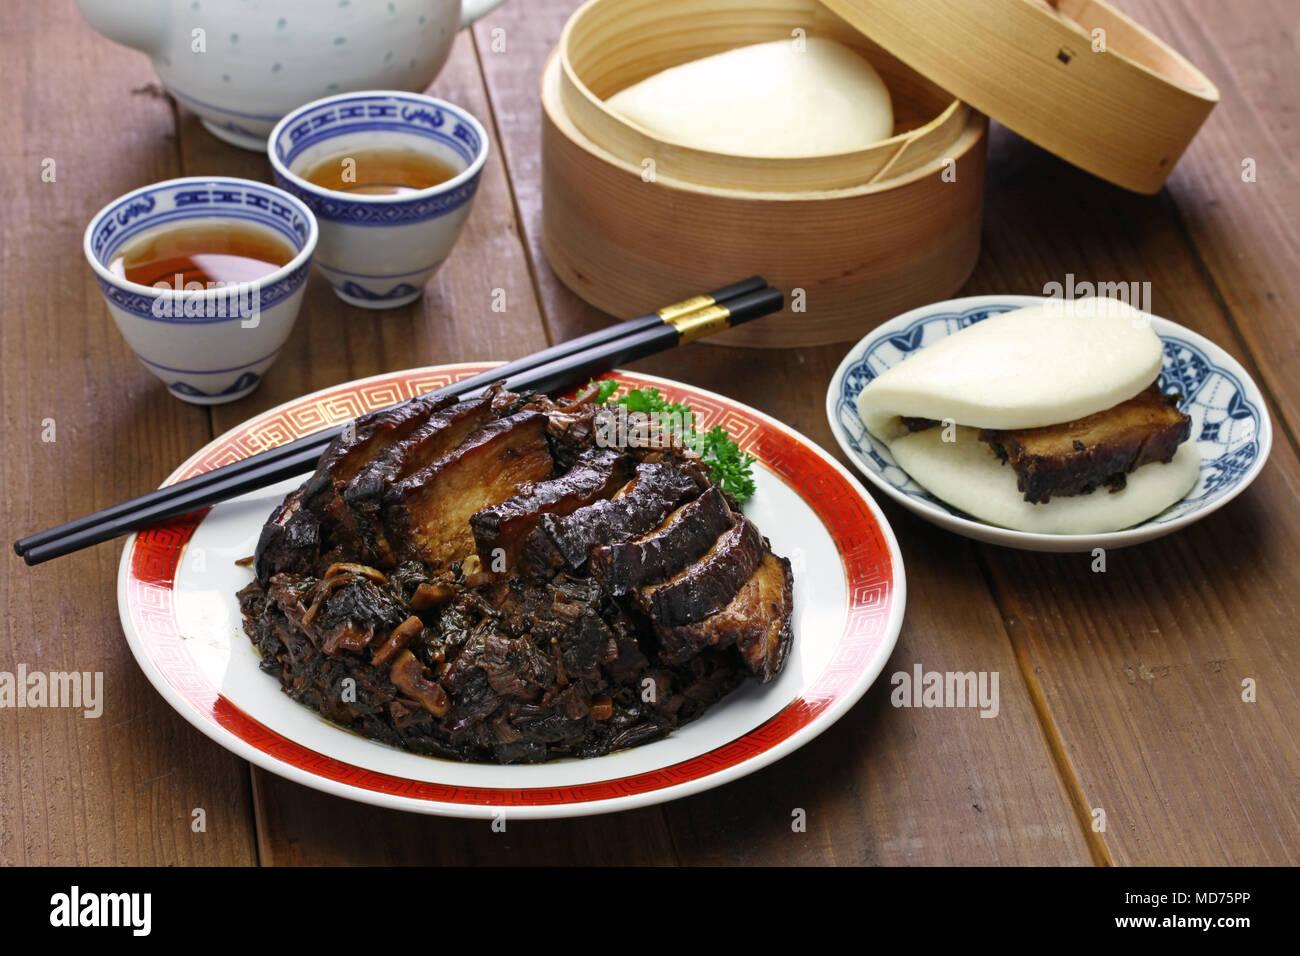 Chinese Pork Buns Stockfotos & Chinese Pork Buns Bilder - Alamy